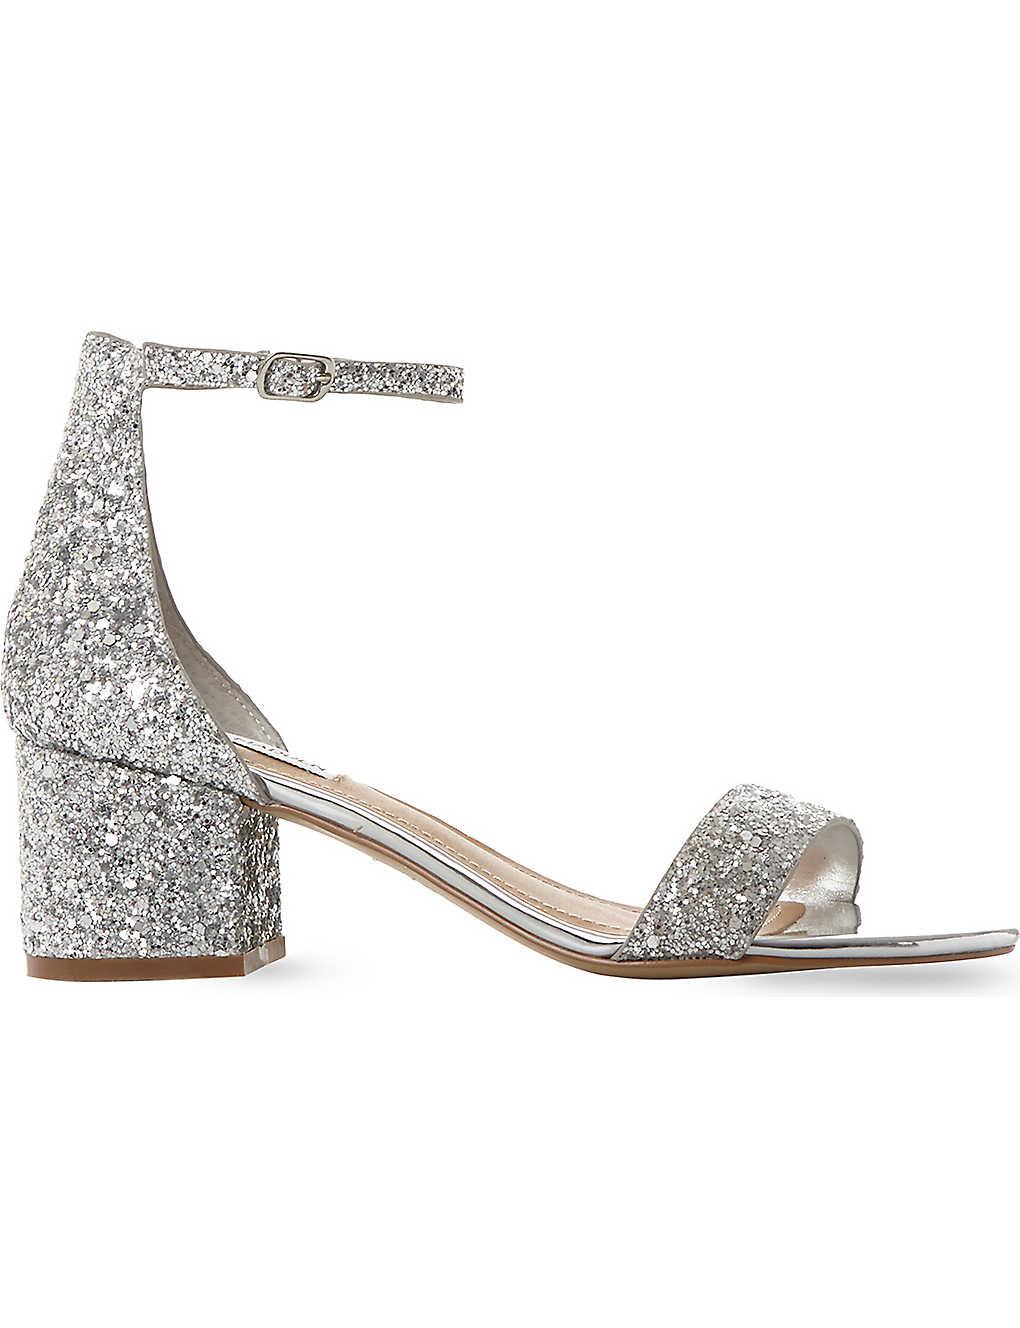 STEVE MADDEN - Irenee glitter block heel sandals  37650faee2d3